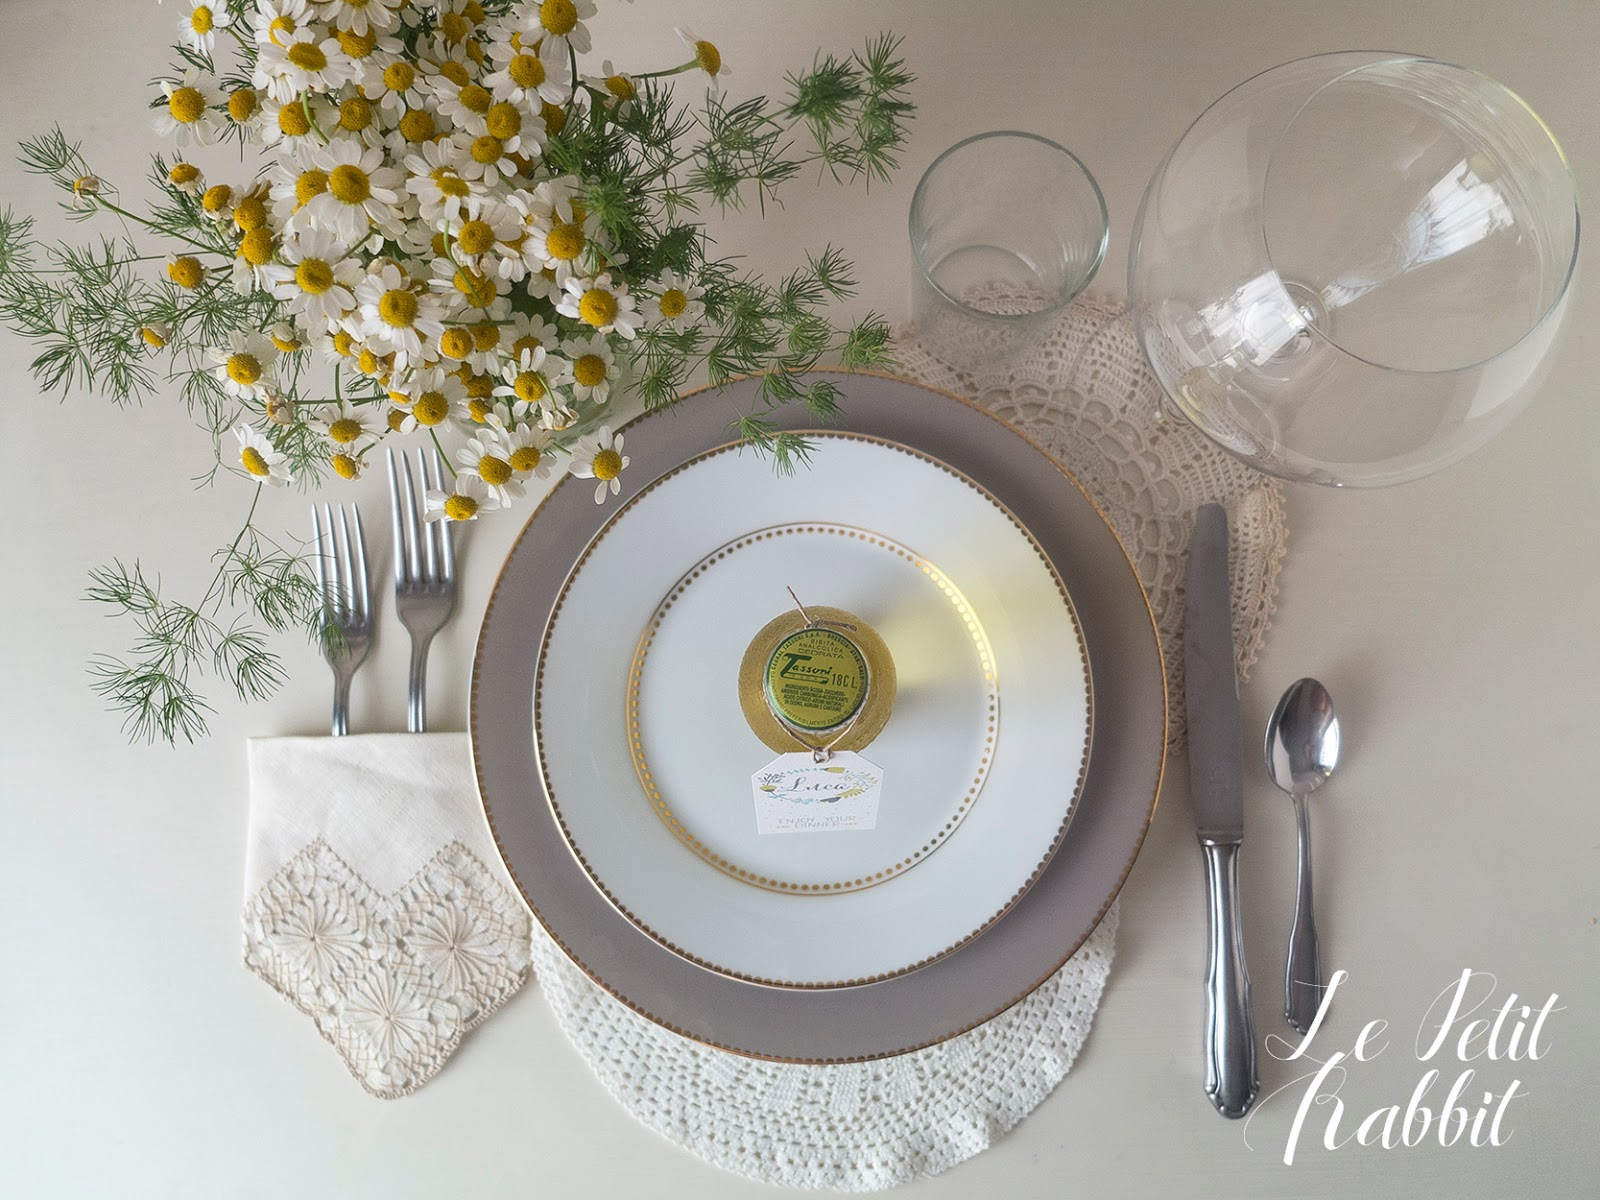 Obbligatori I Segnaposto Al Matrimonio.Wedding Tips 03 Il Segnaposto Le Petit Rabbit